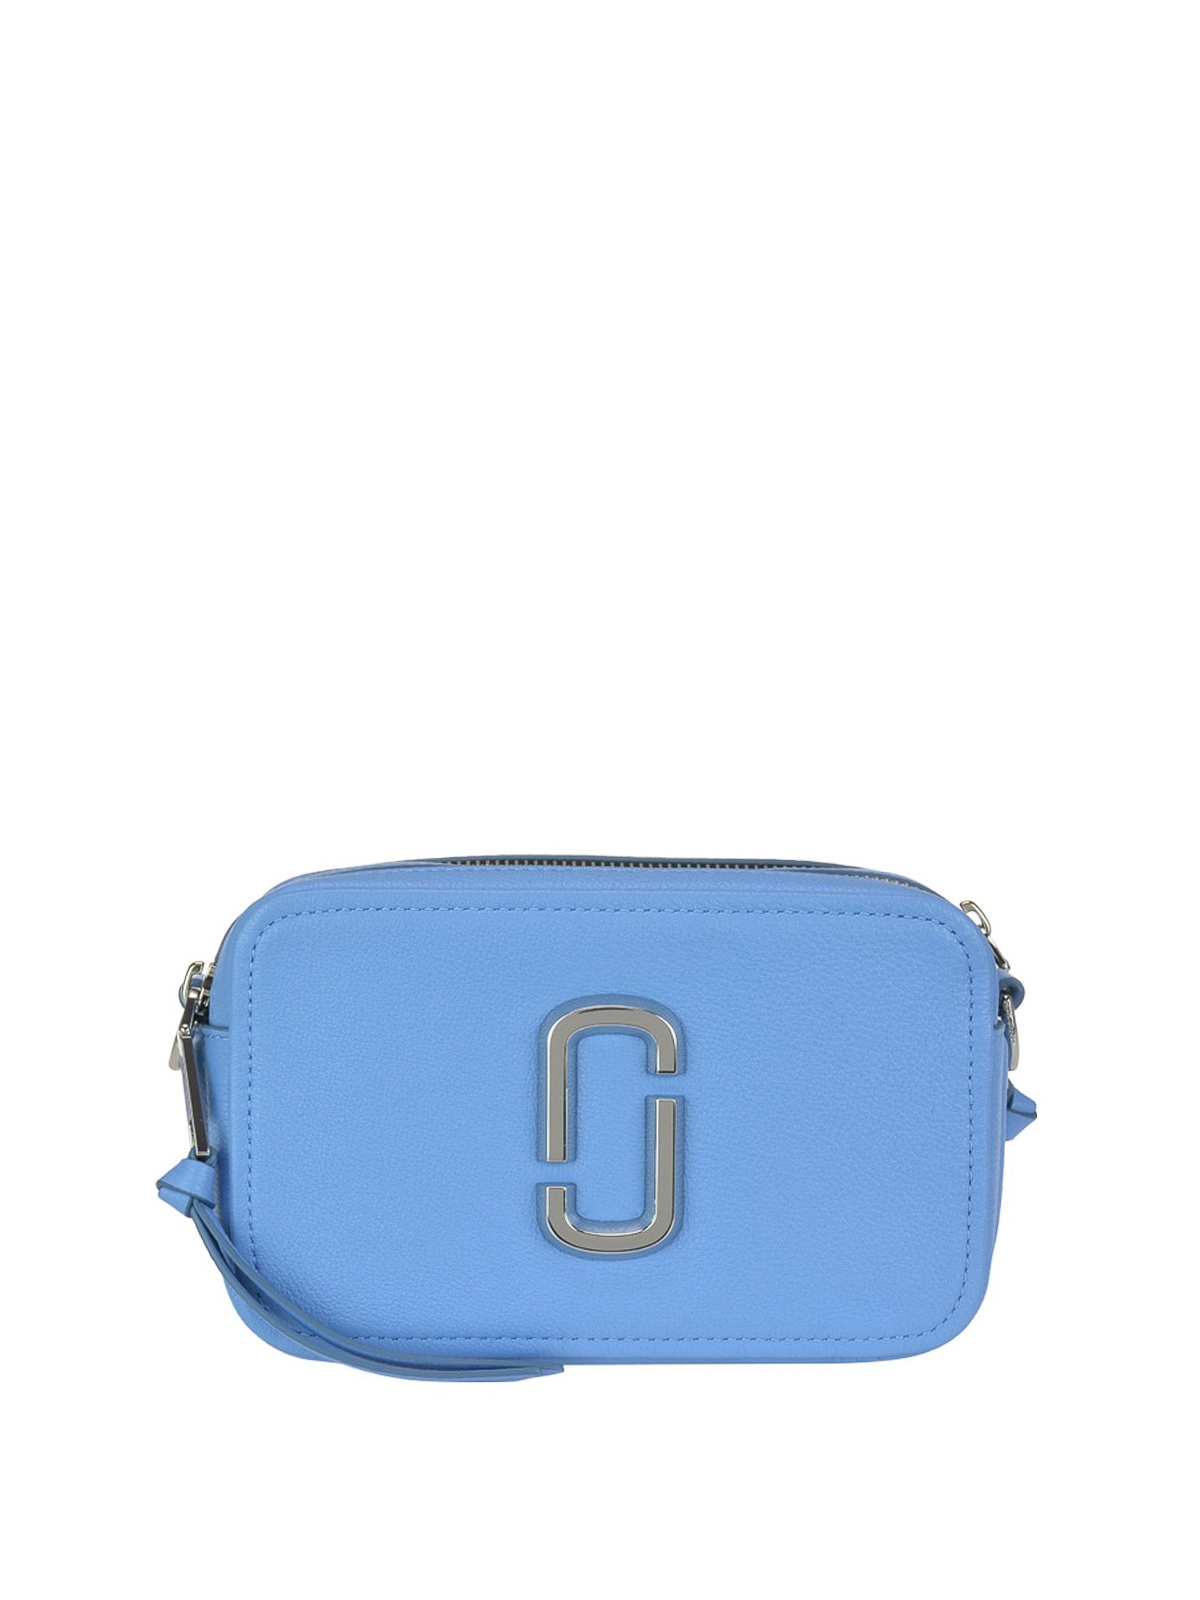 21 Pastel Blue Bedroom Designs Decorating Ideas: The Softshot 21 Light Blue Crossbody Bag